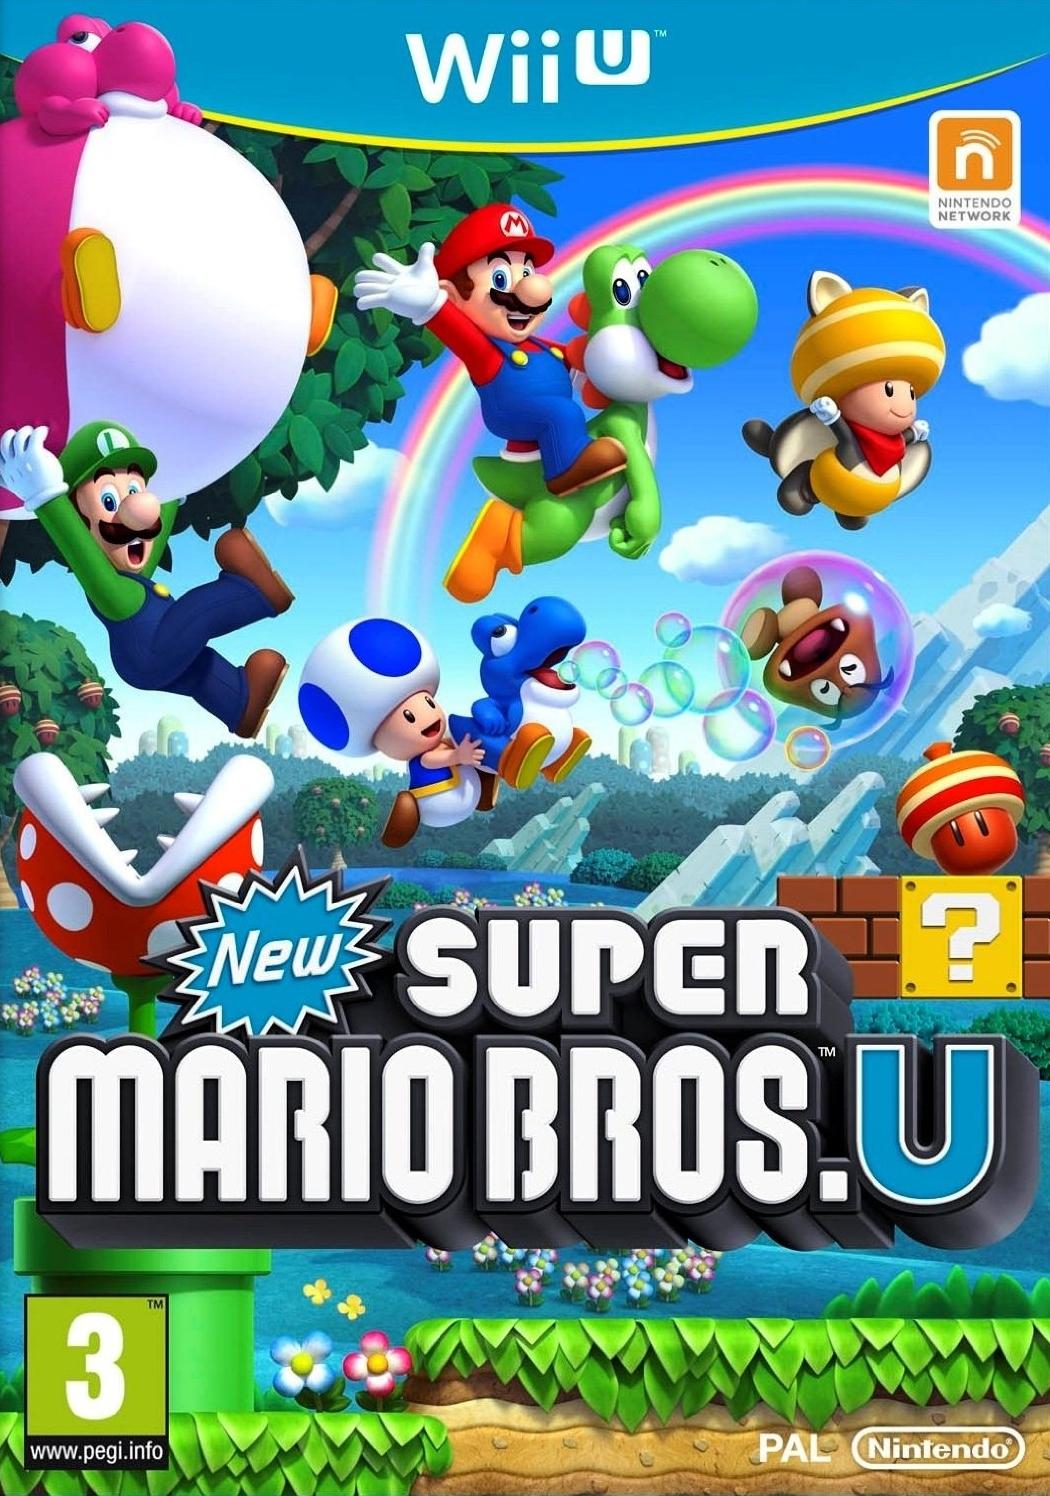 jaquette-new-super-mario-bros-u-wii-u-wiiu-cover-avant-g-1347554447.jpg